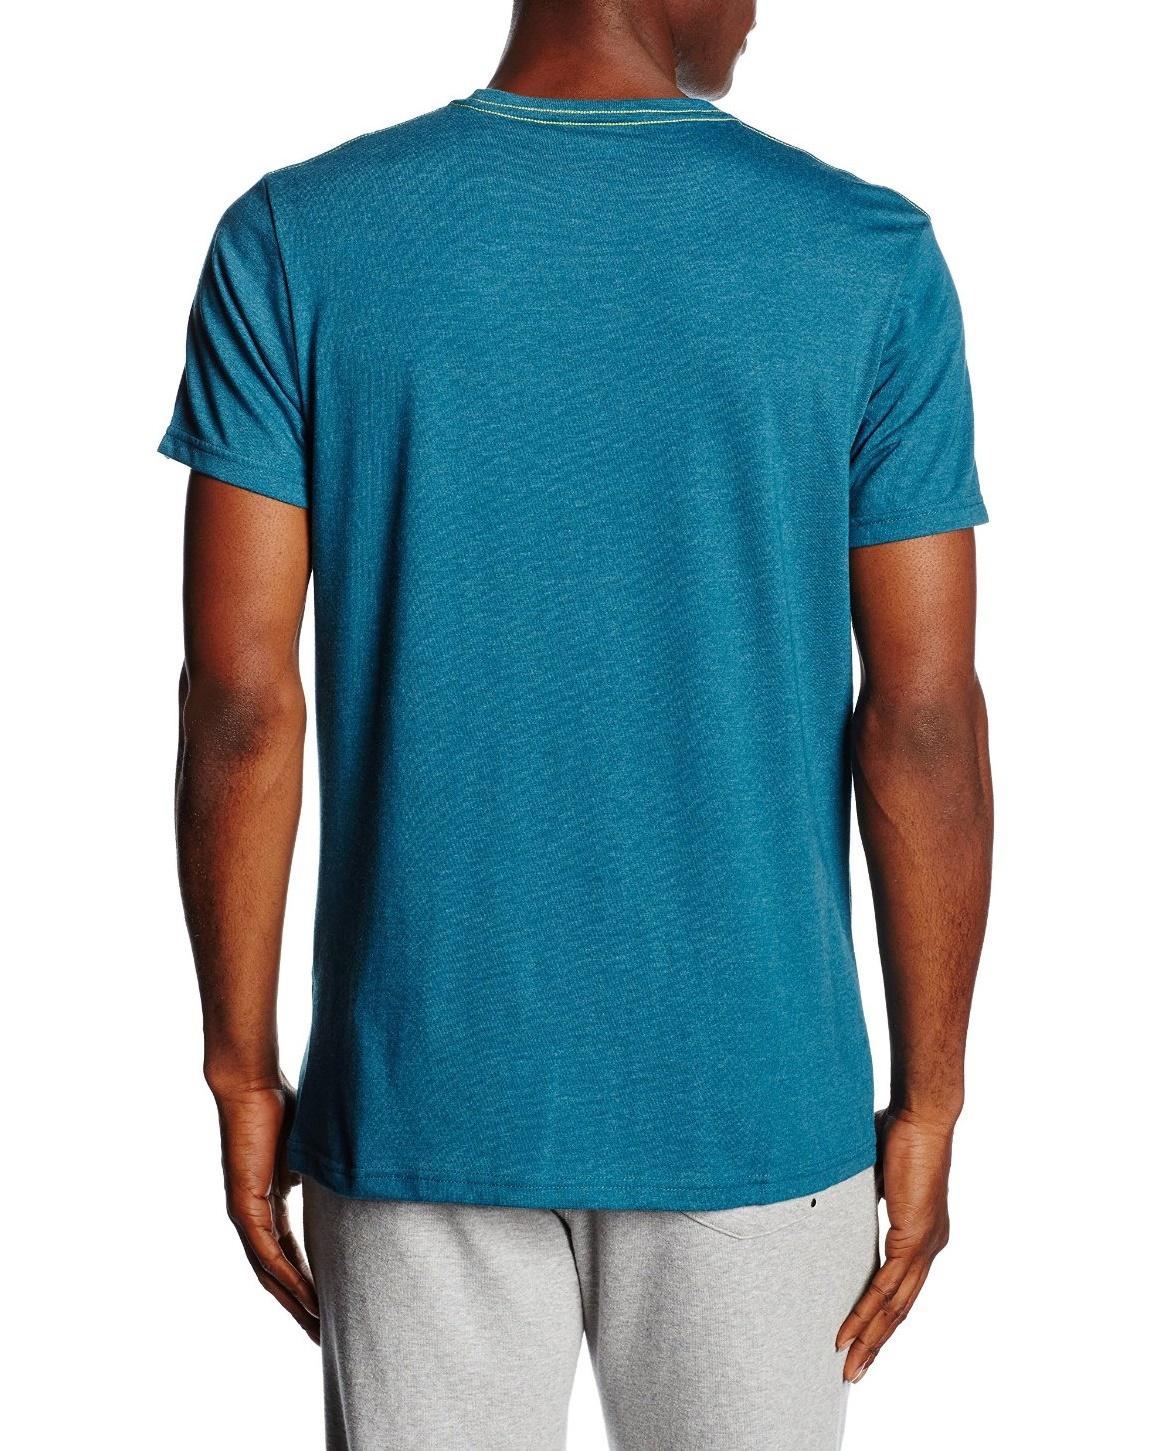 Мужская футболка Asics Graphic SS Top (125074 8125)